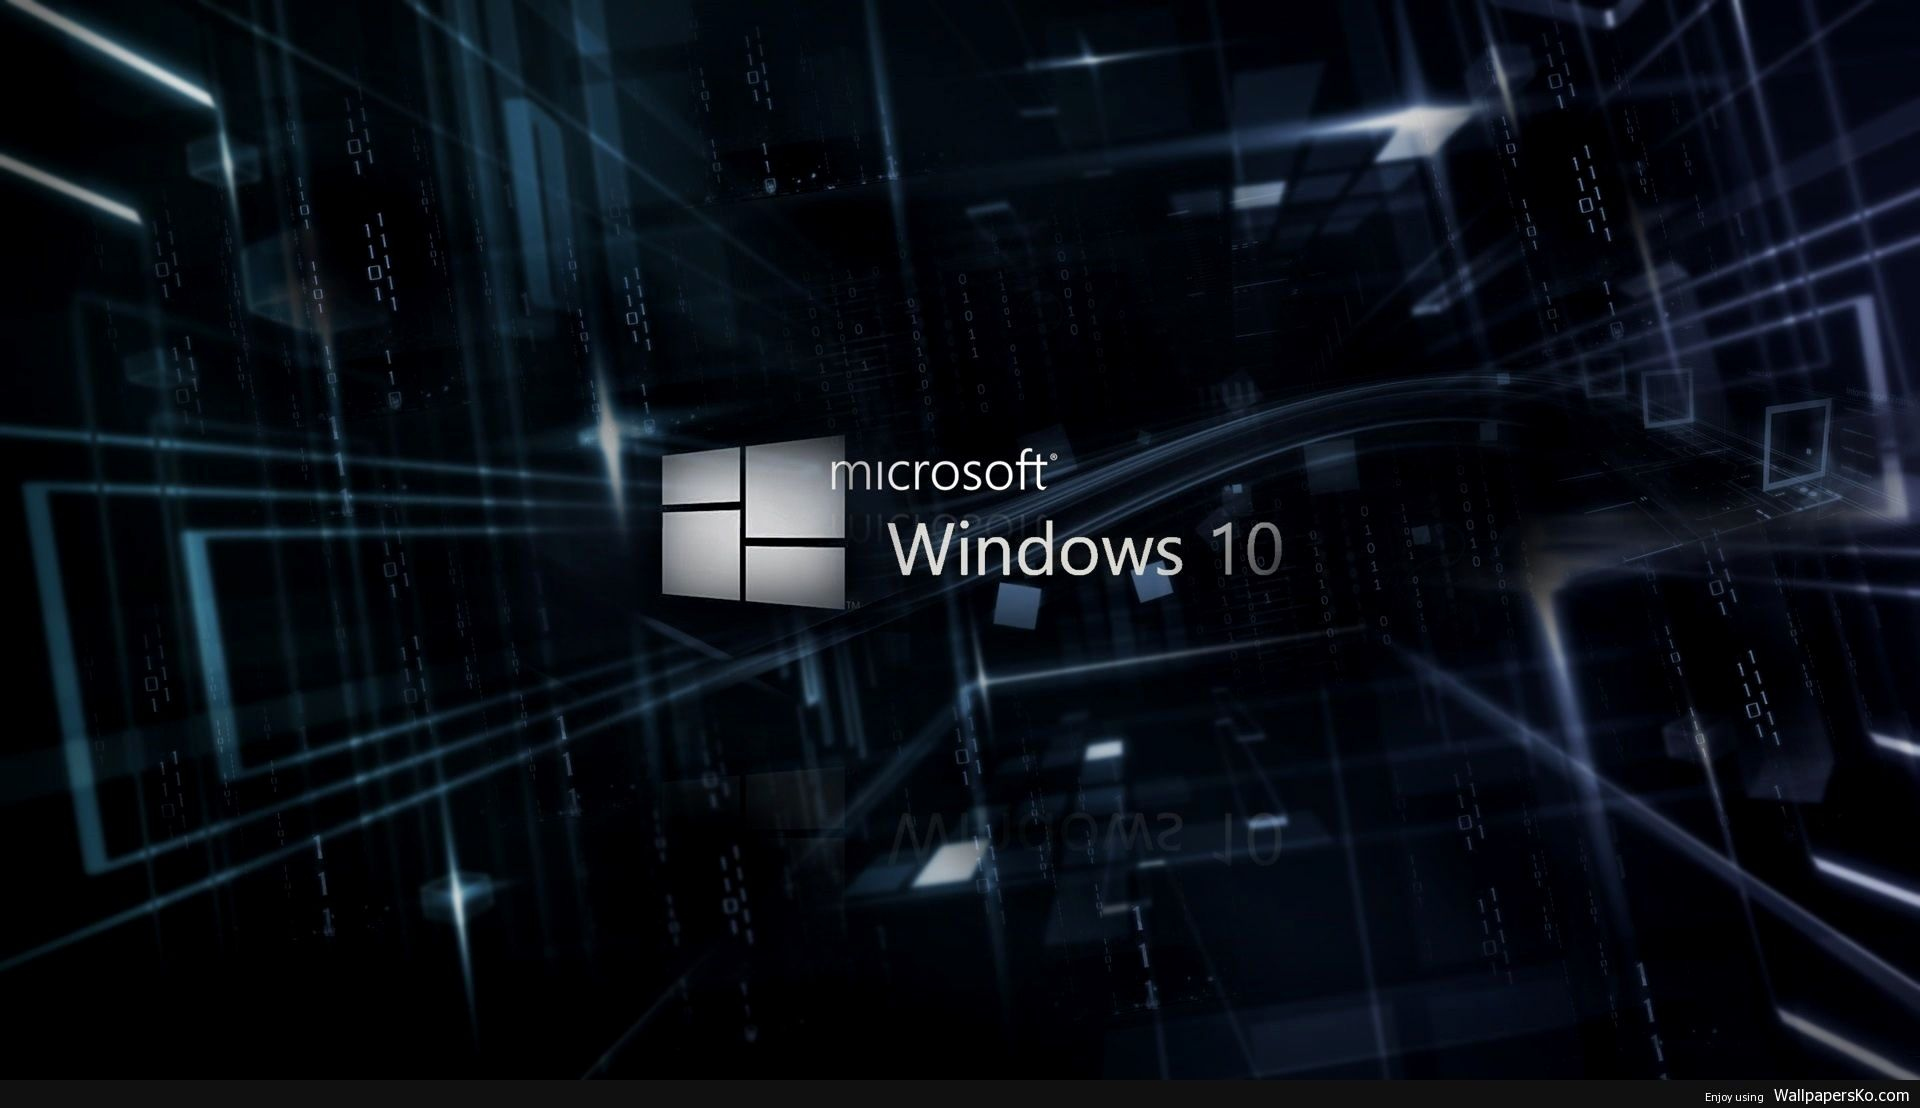 Windows Xp Wallpaper 4k Iphone Trick Wallpapers Para Windows 10 Imagenes De Windows 10 Wallpaper Para Pc